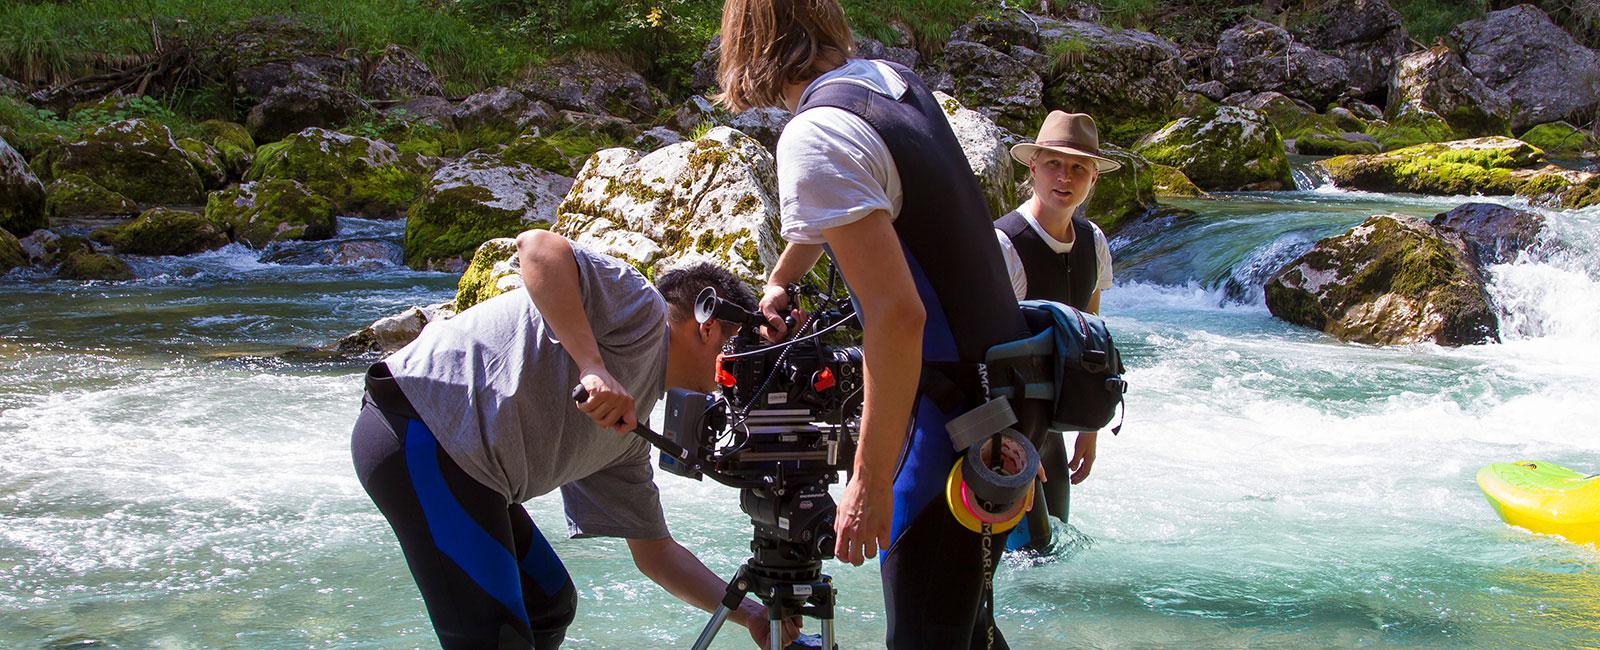 Videodreh Camping in Bayern Fluss